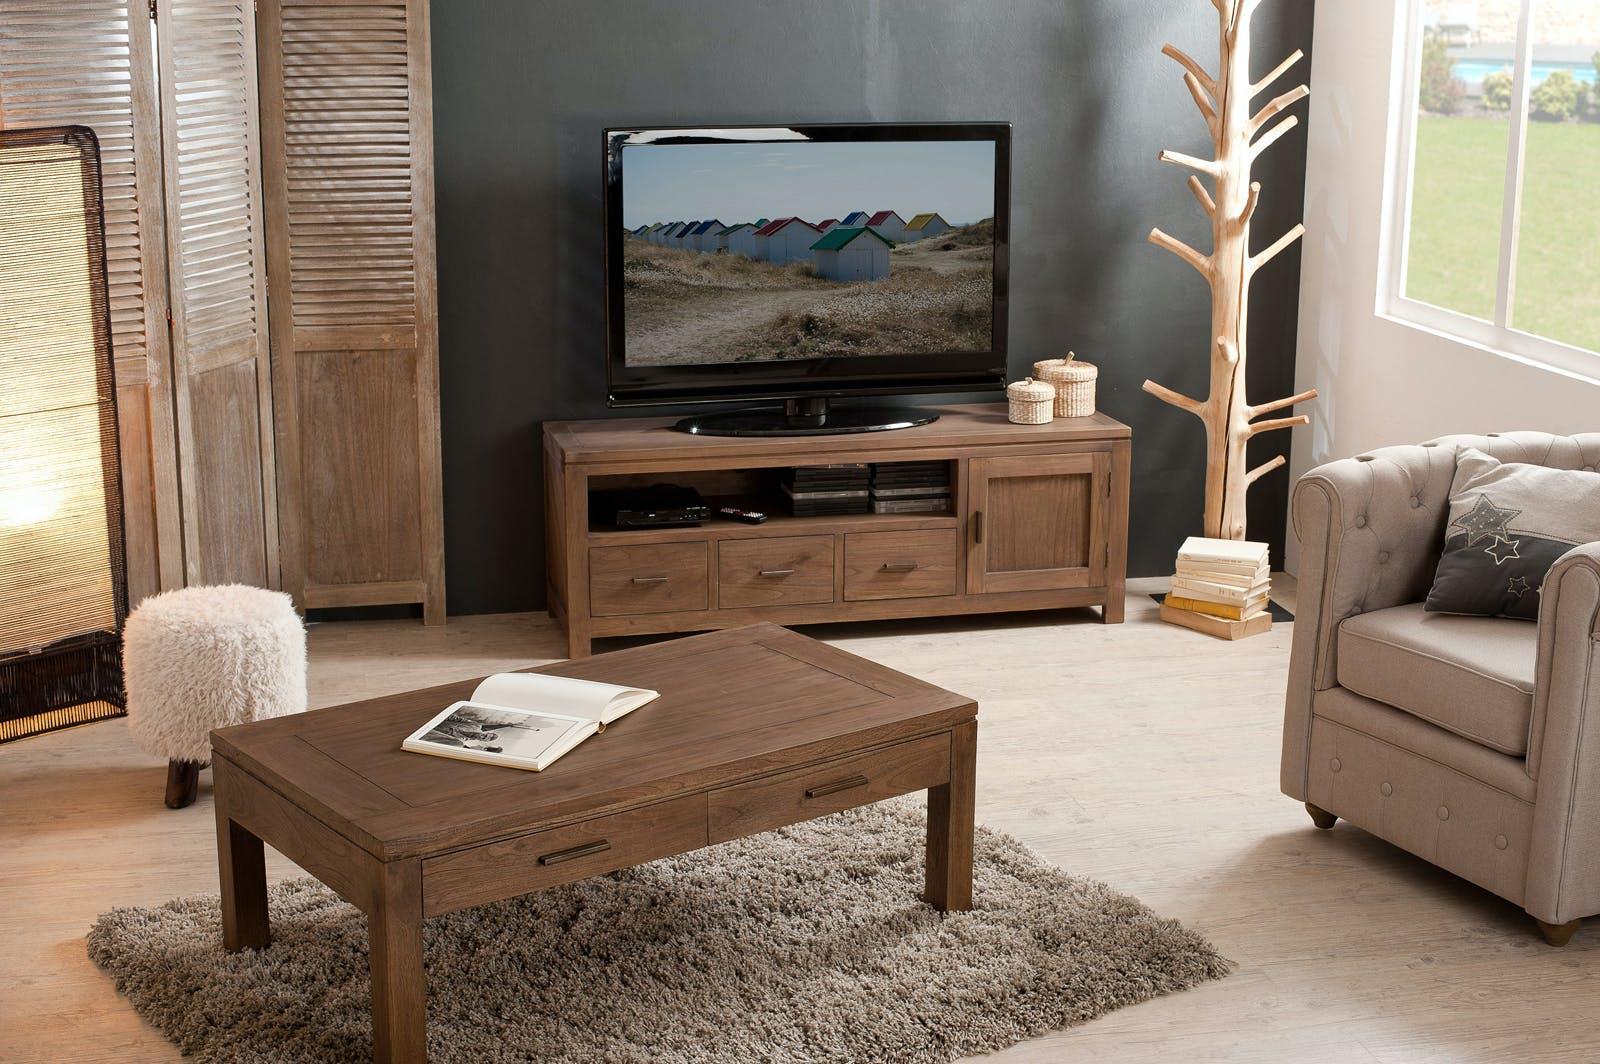 Meuble TV bois exotique 1 porte LOUNA